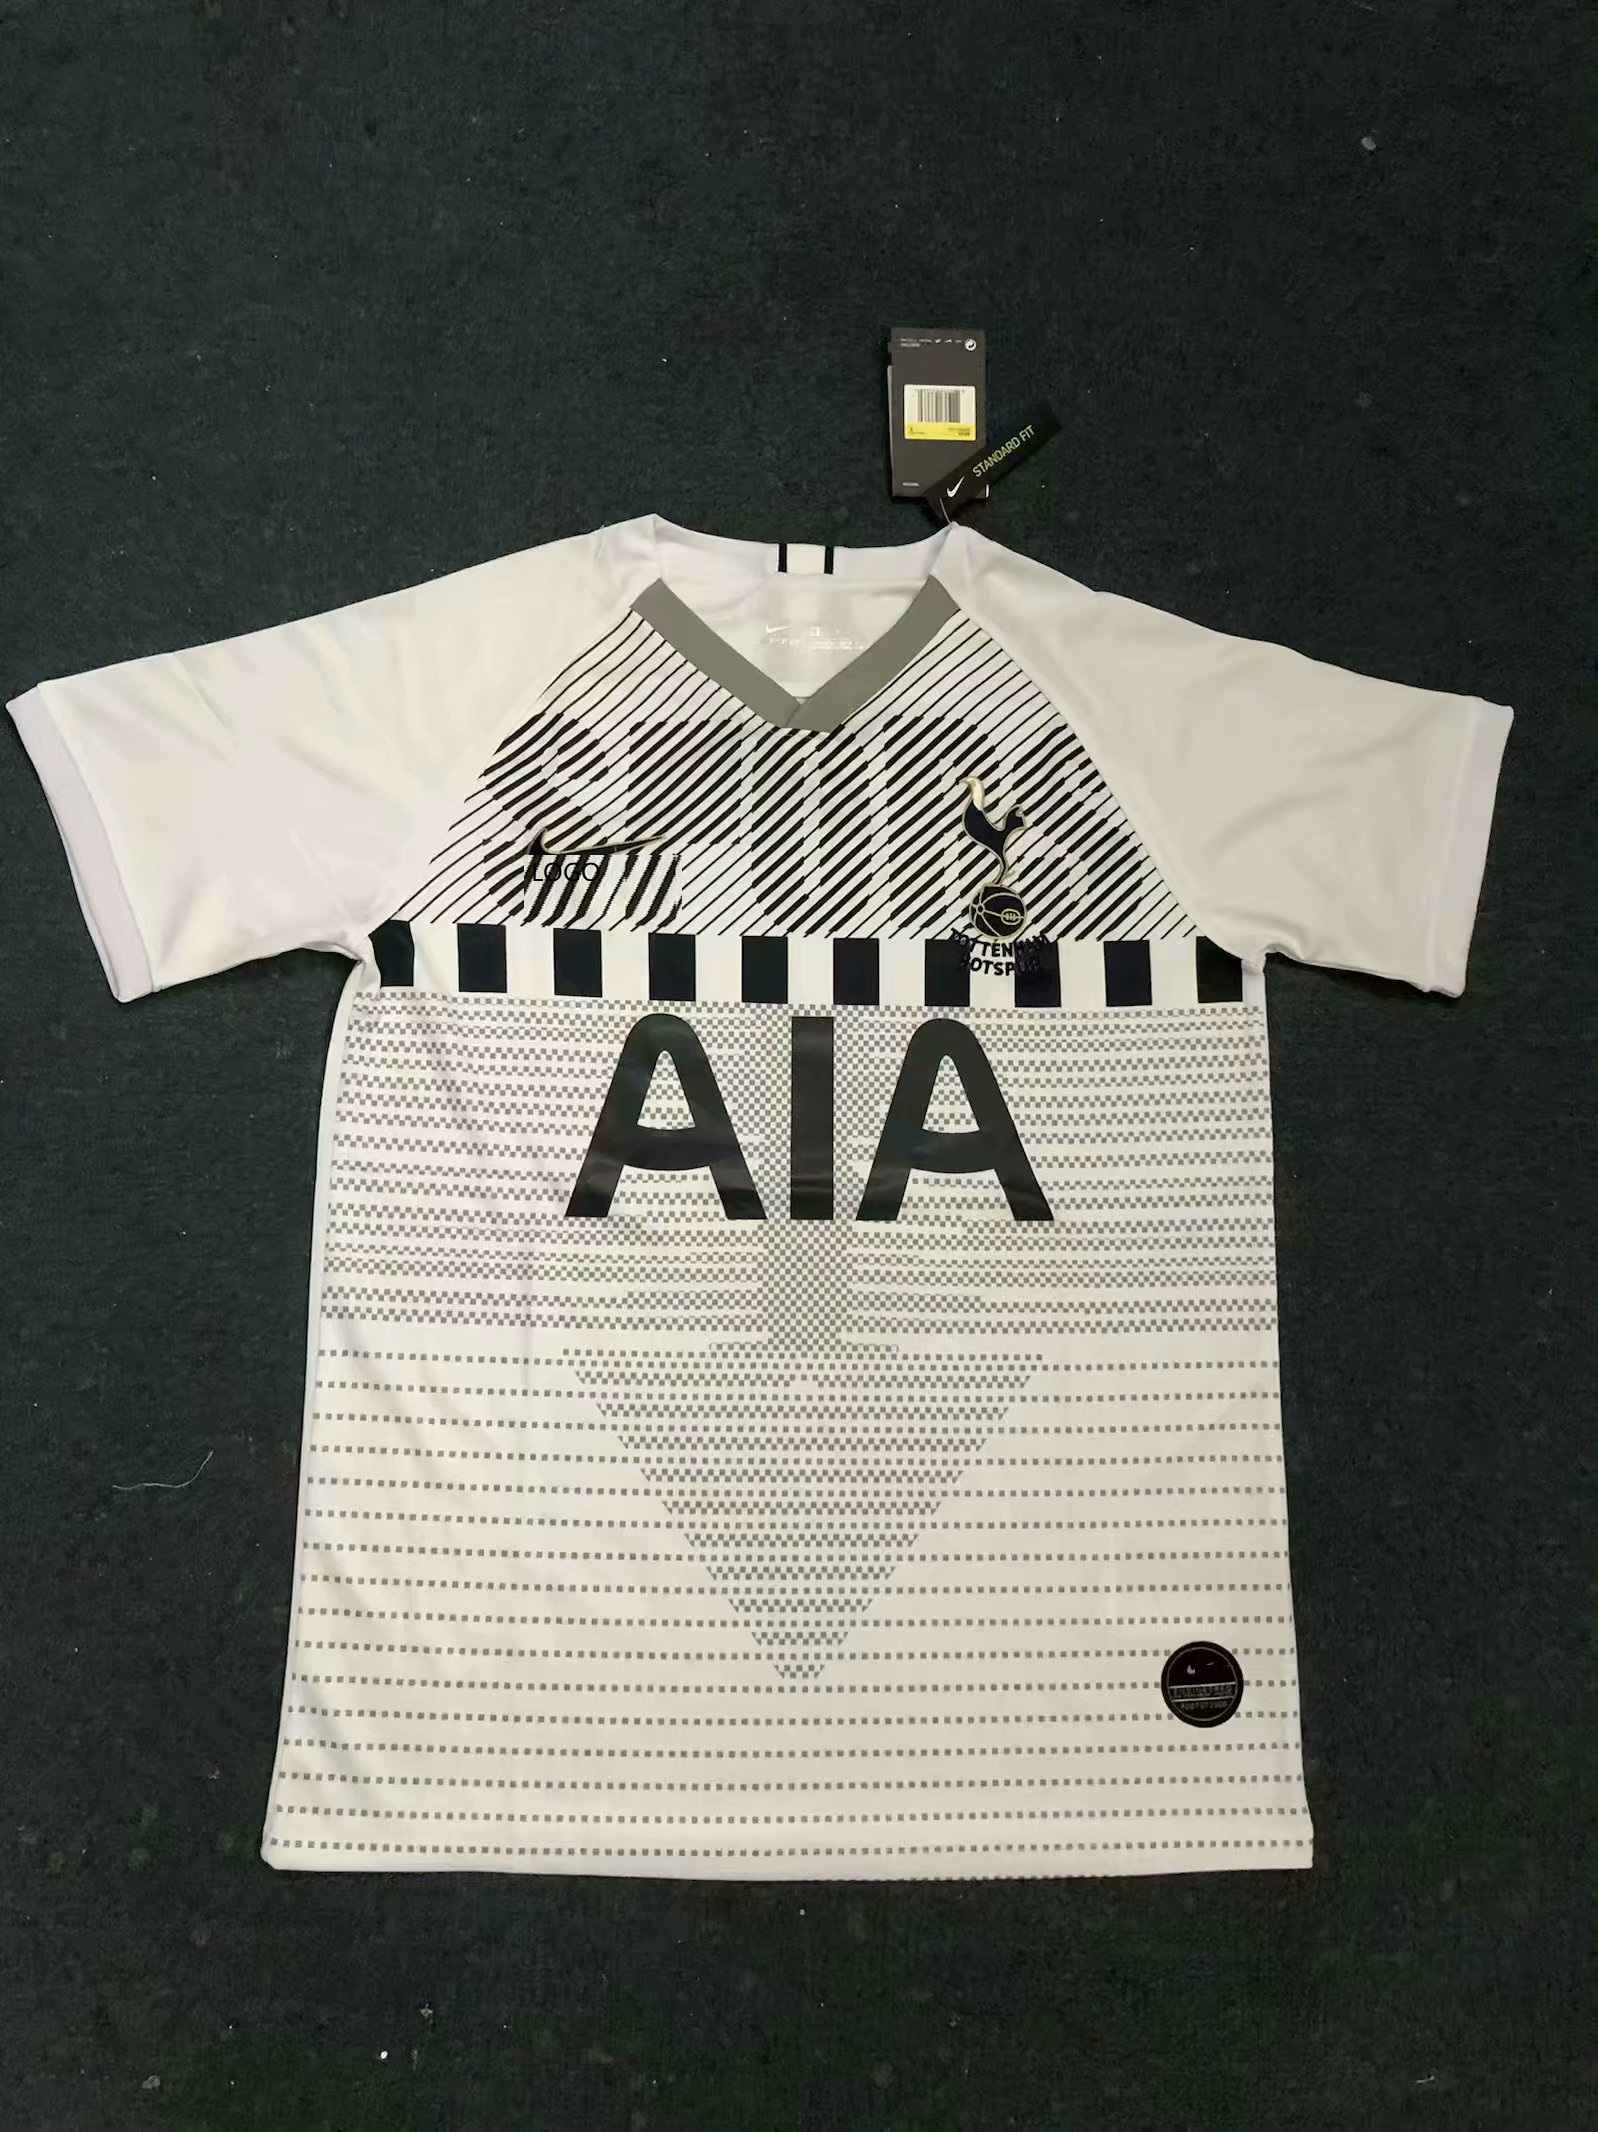 ed35c4d9bc8 19/20 men thai quality Tottenham Hotspur Commemorative Edition Soccer jersey  personalized